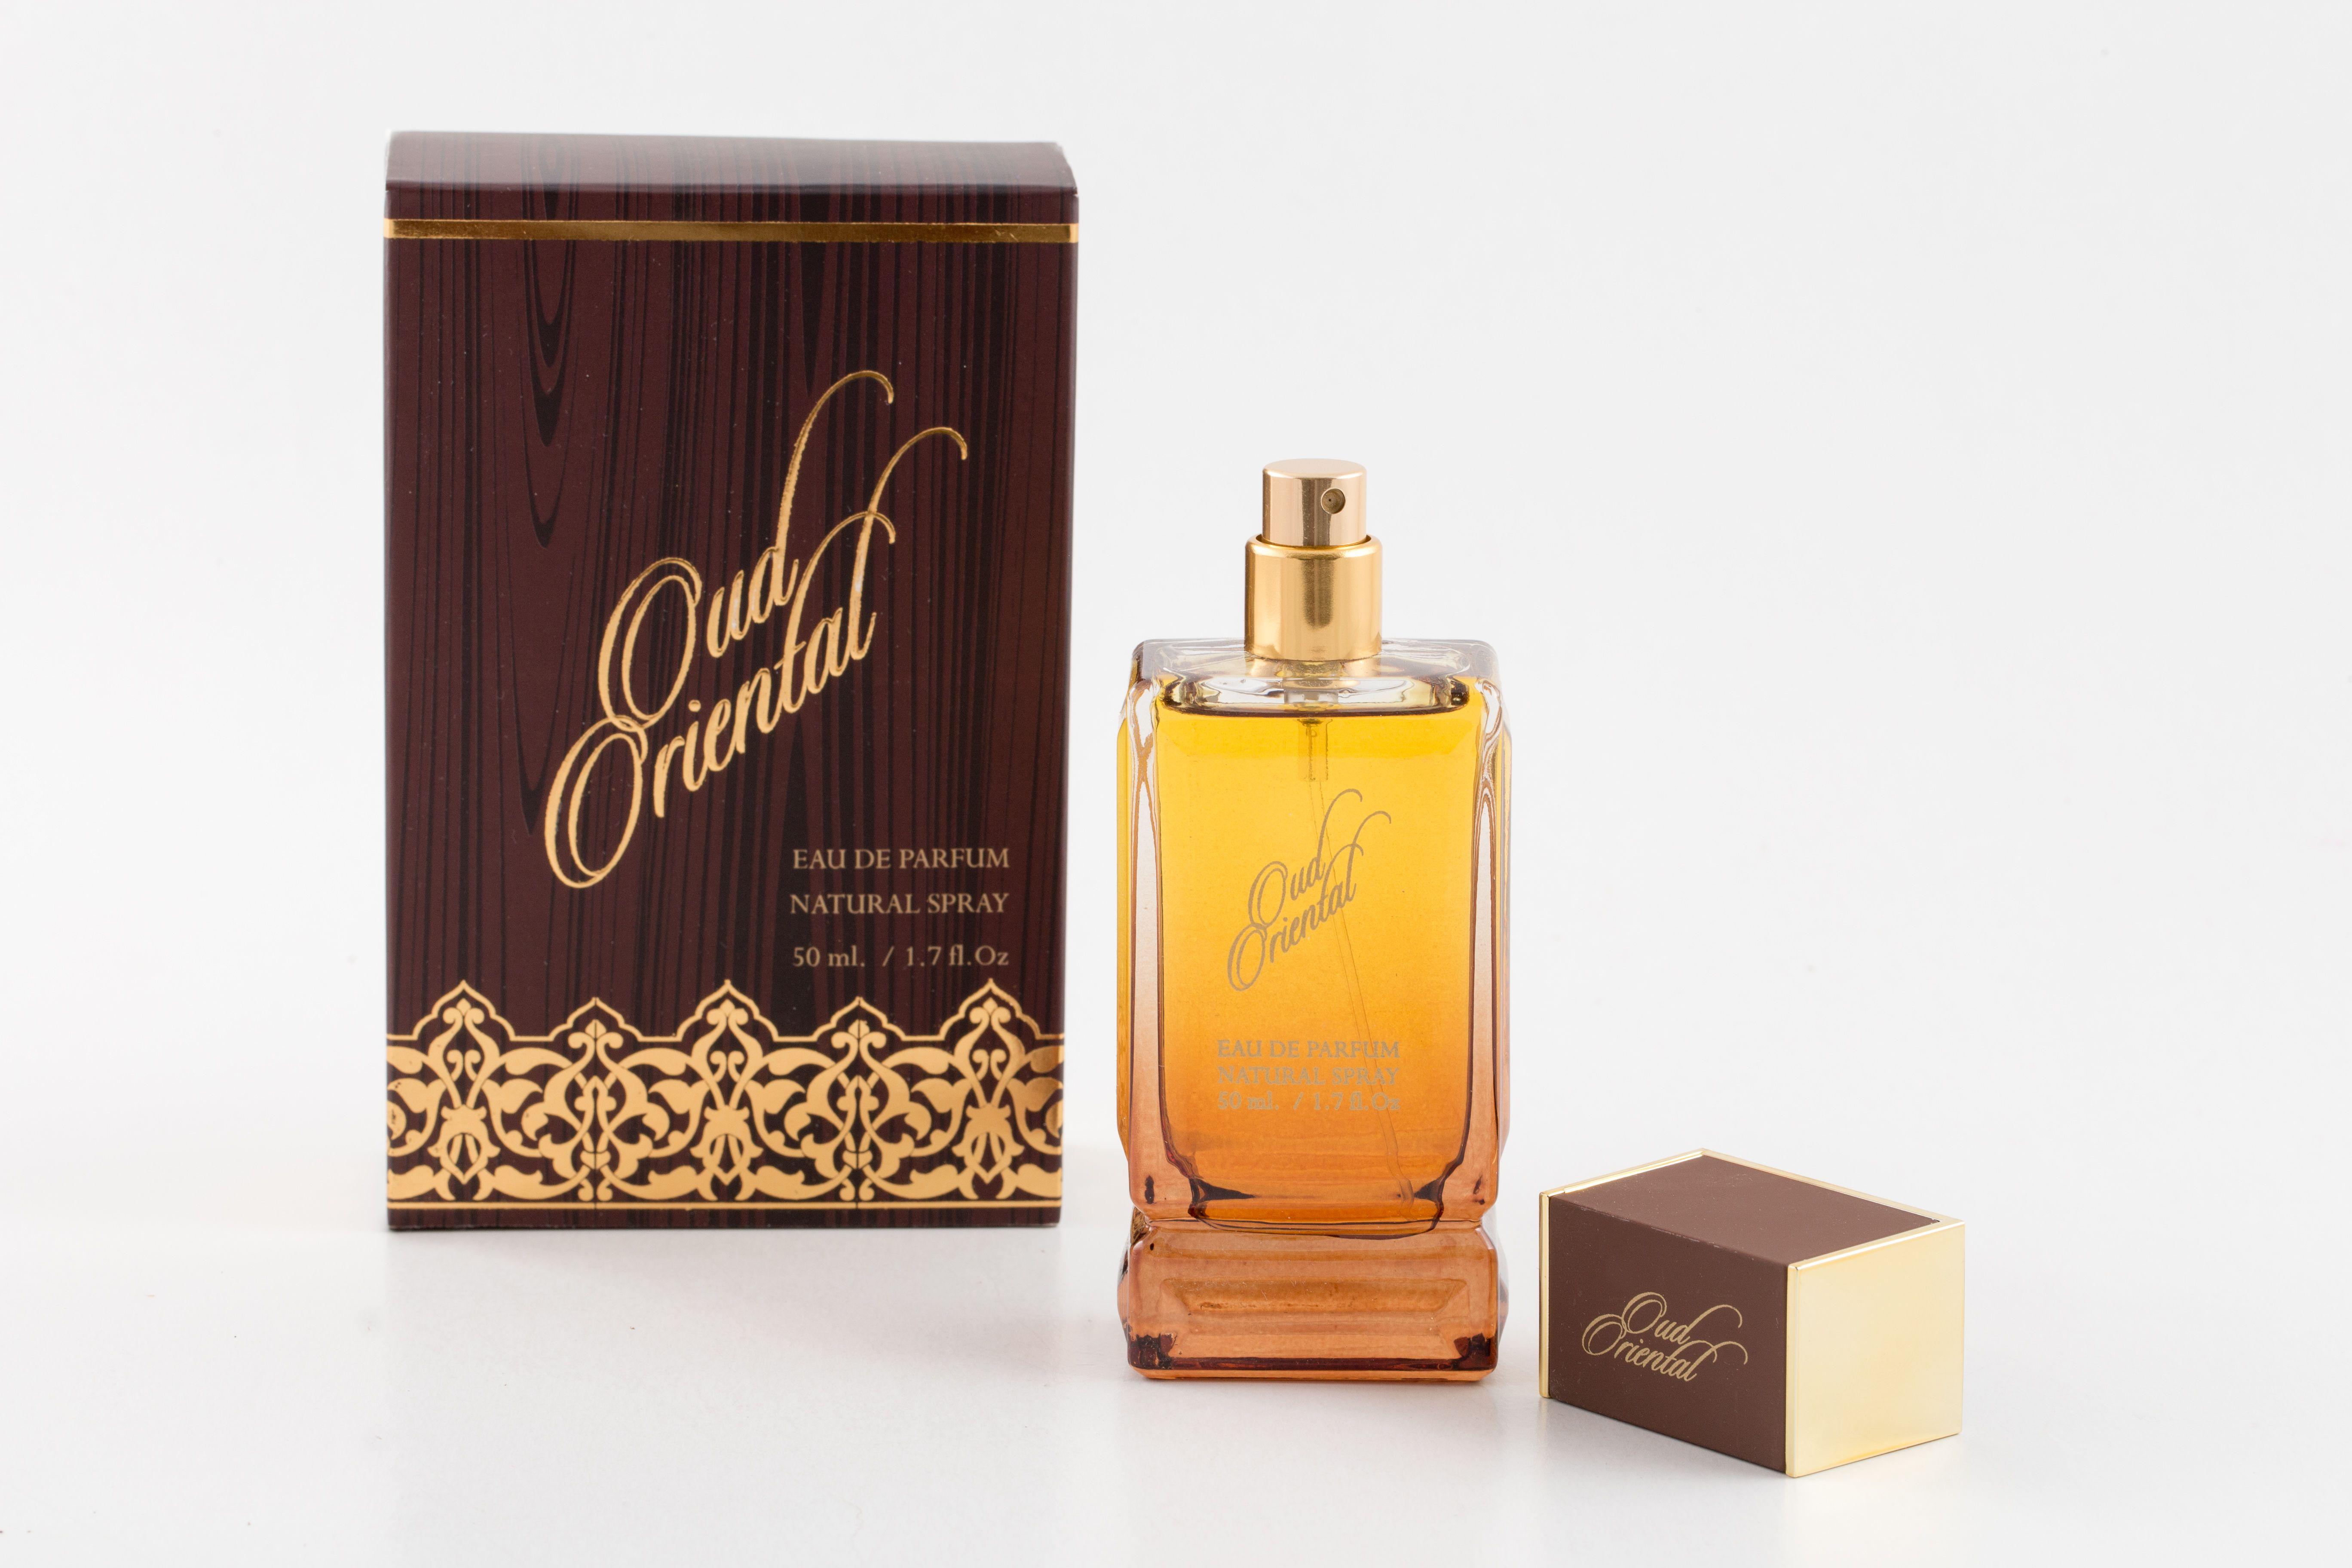 Pin By Alsharqiyah الشرقية للعود On اورينت العود Perfume Bottles Perfume Bottle